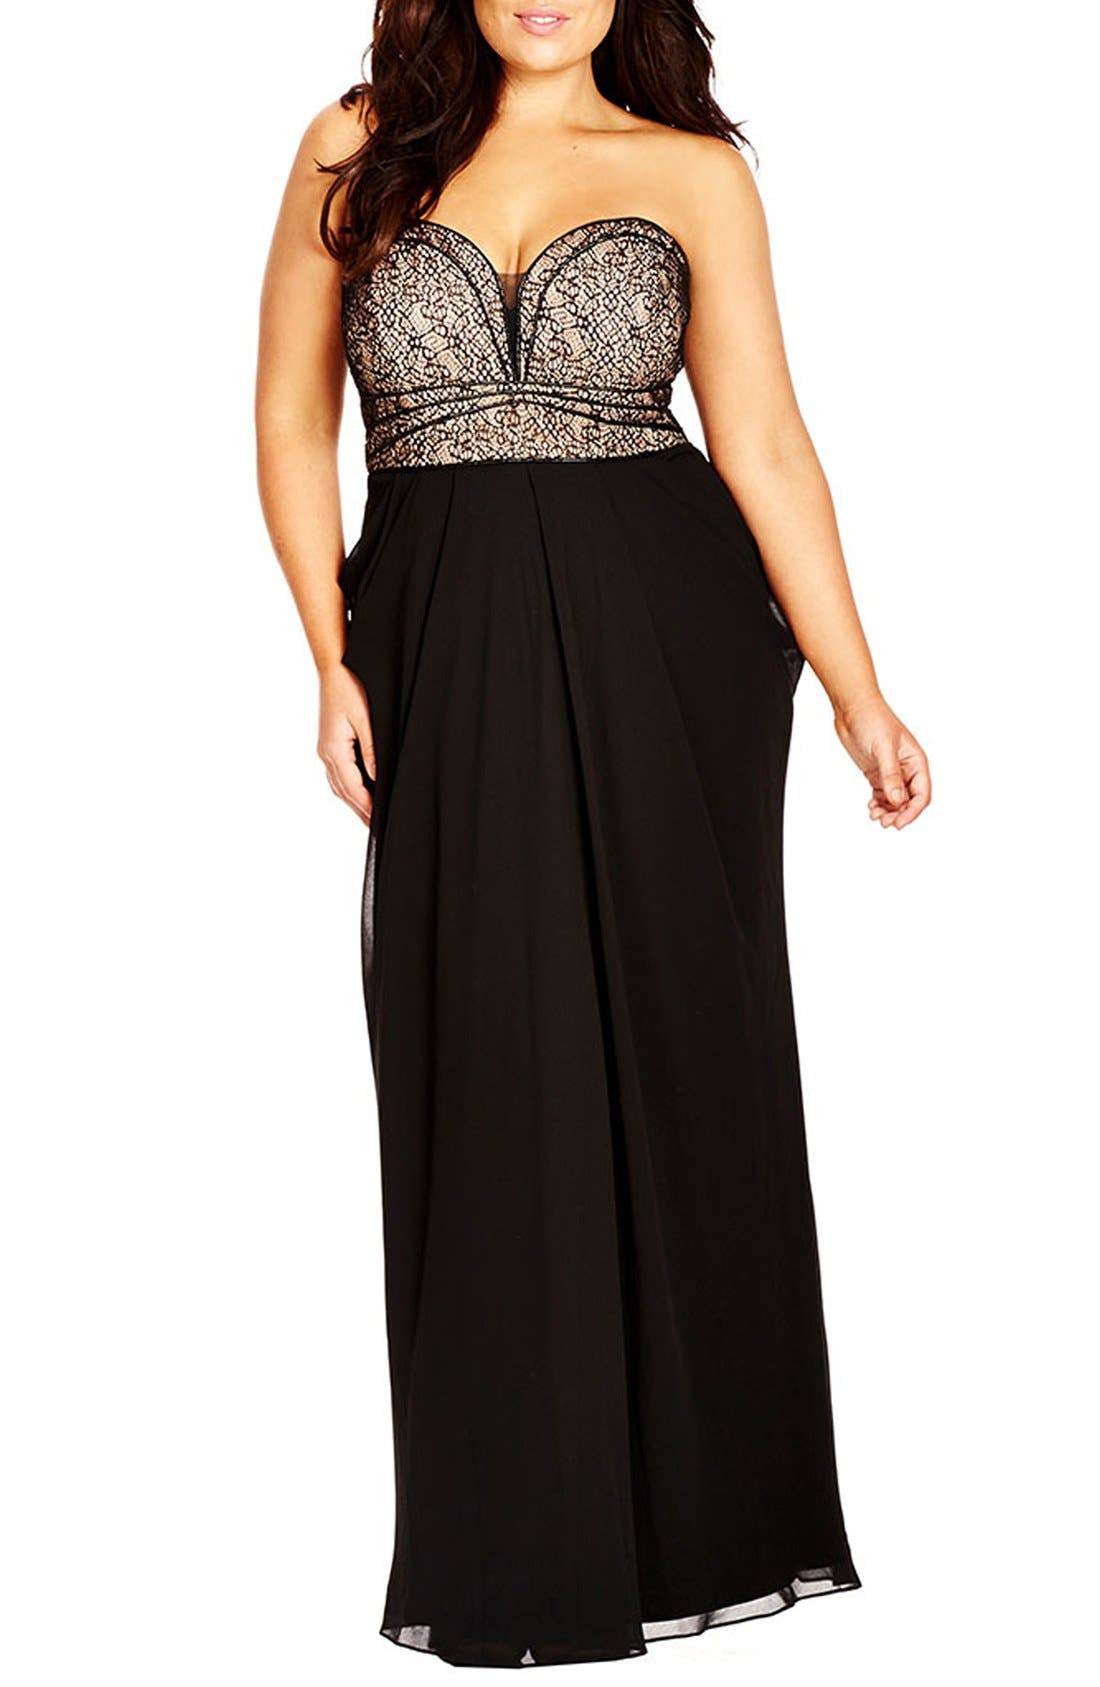 CITY CHIC Motown Strapless Lace & Chiffon Maxi Dress, Main, color, BLACK